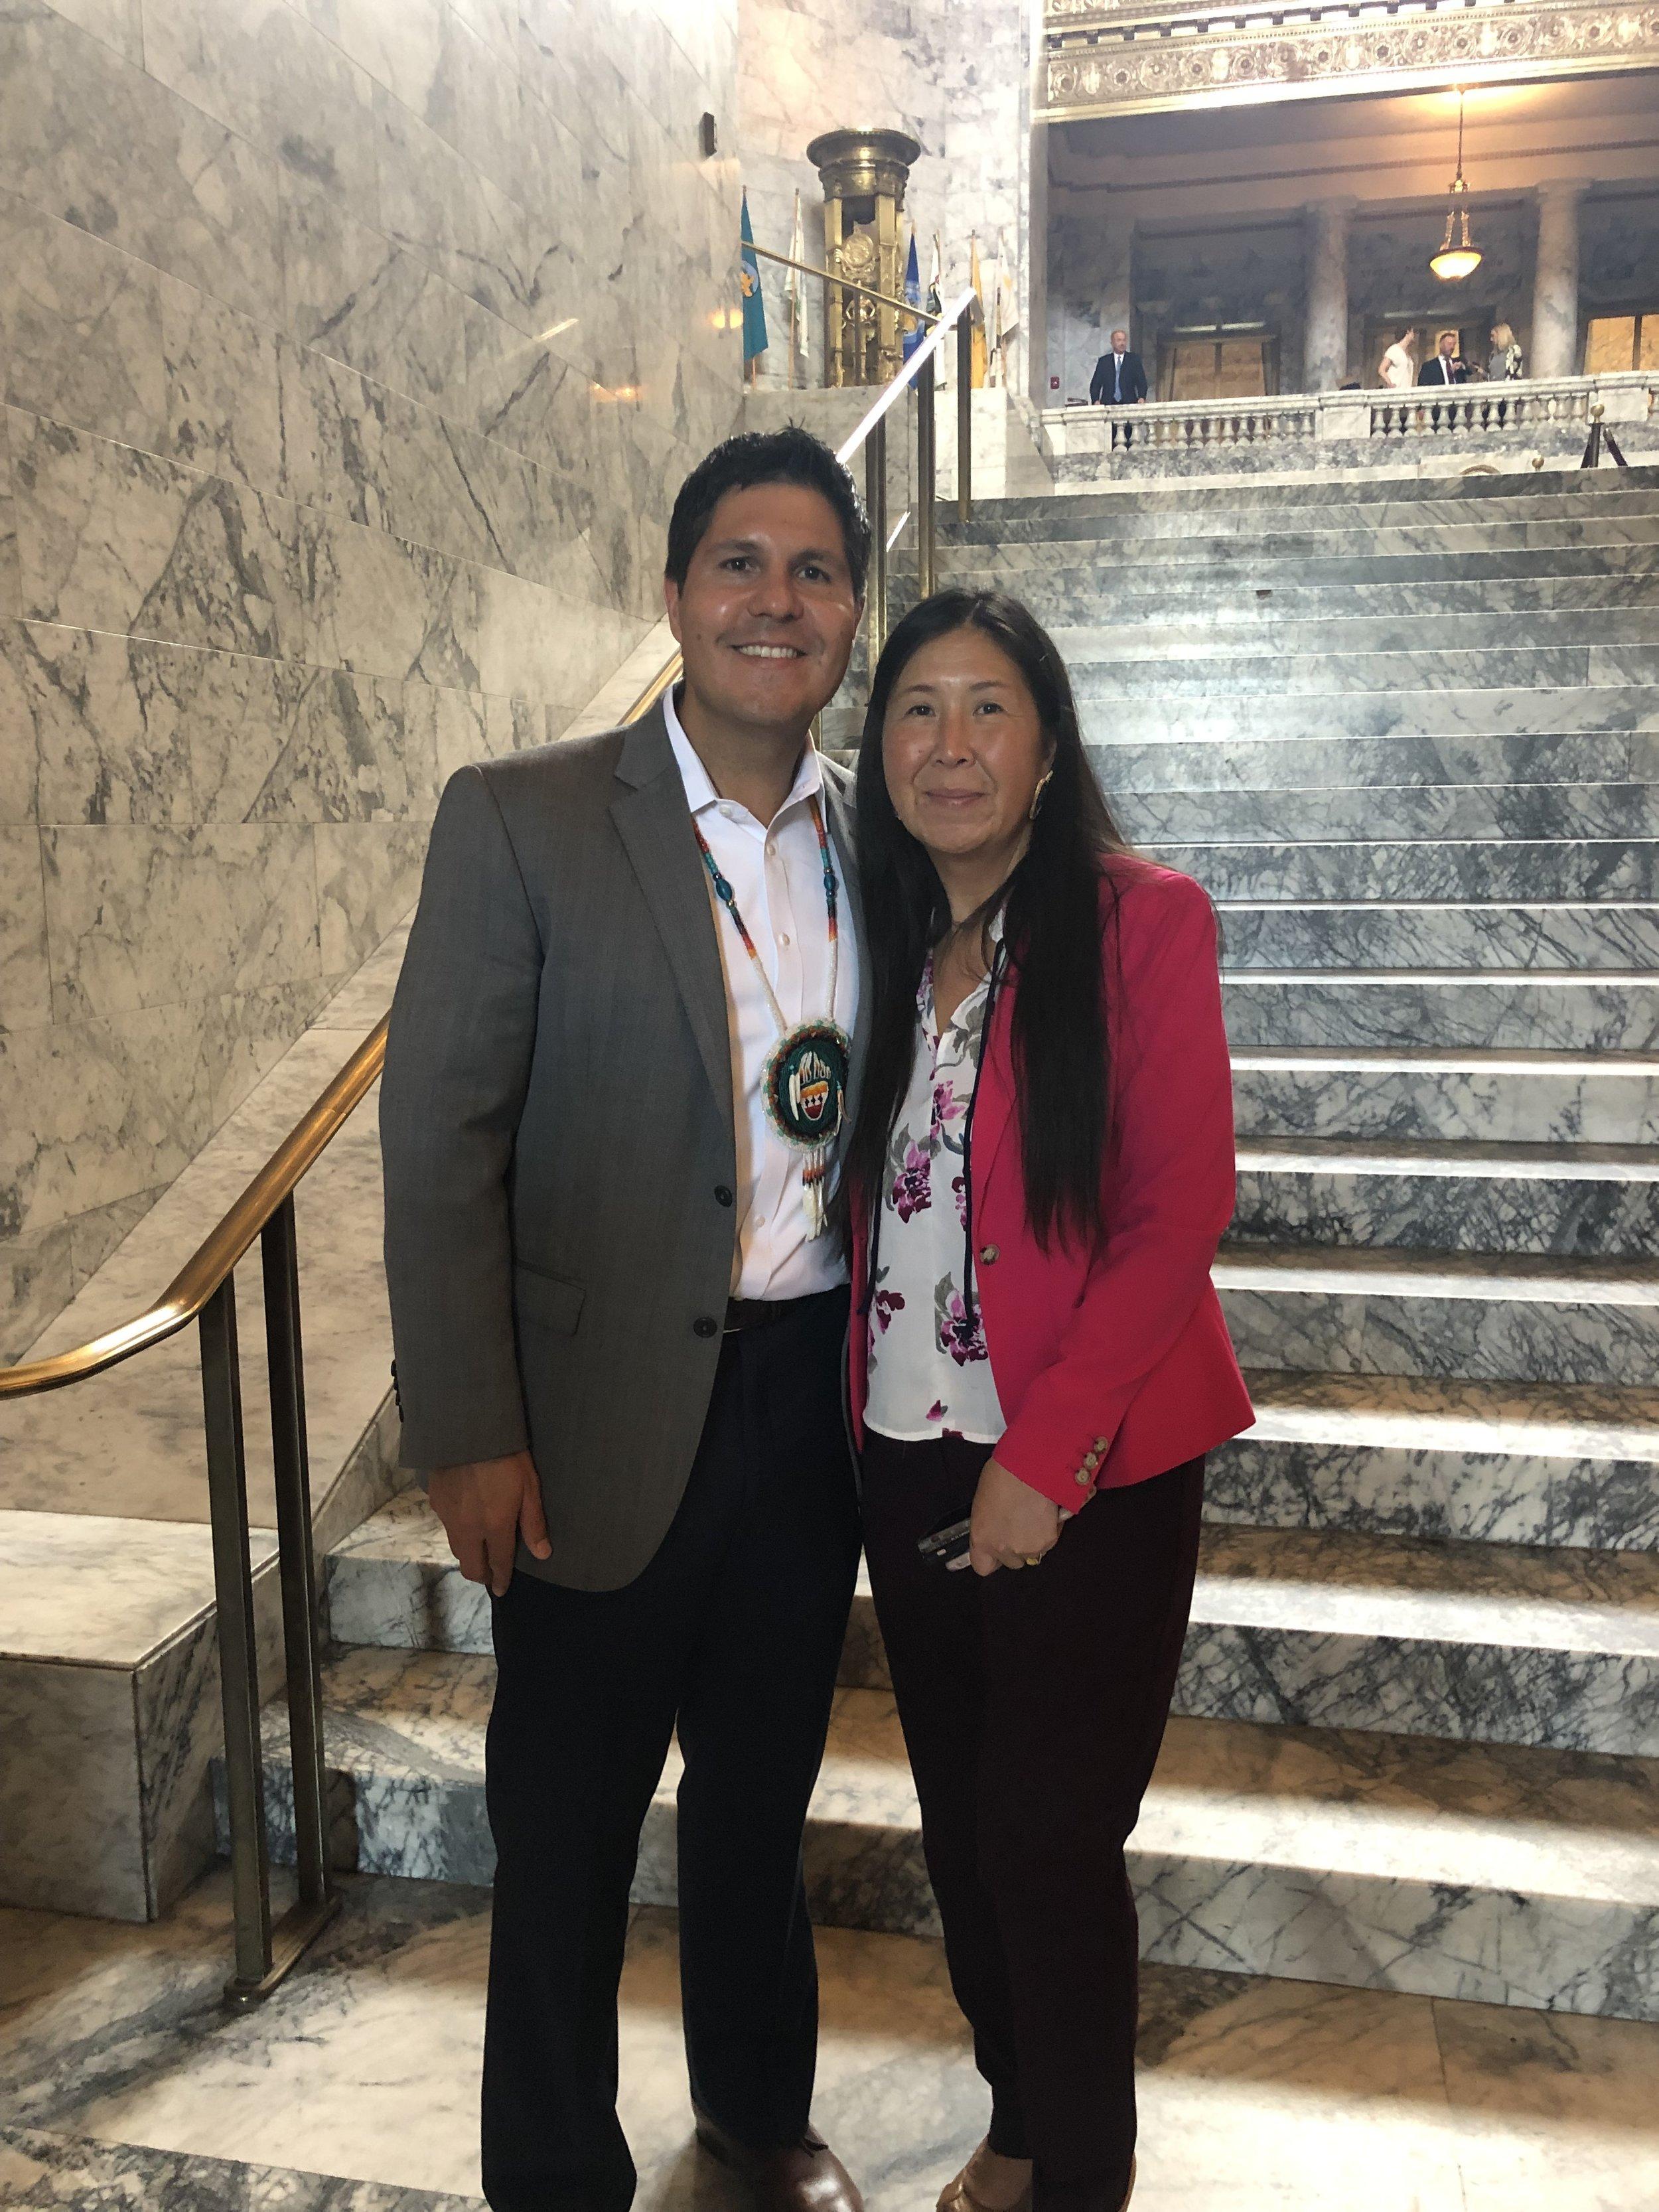 Gabe Galanda and Washington State Representative Debra Lekanoff (Tlingit/Aleut), HB 1485's prime sponsor